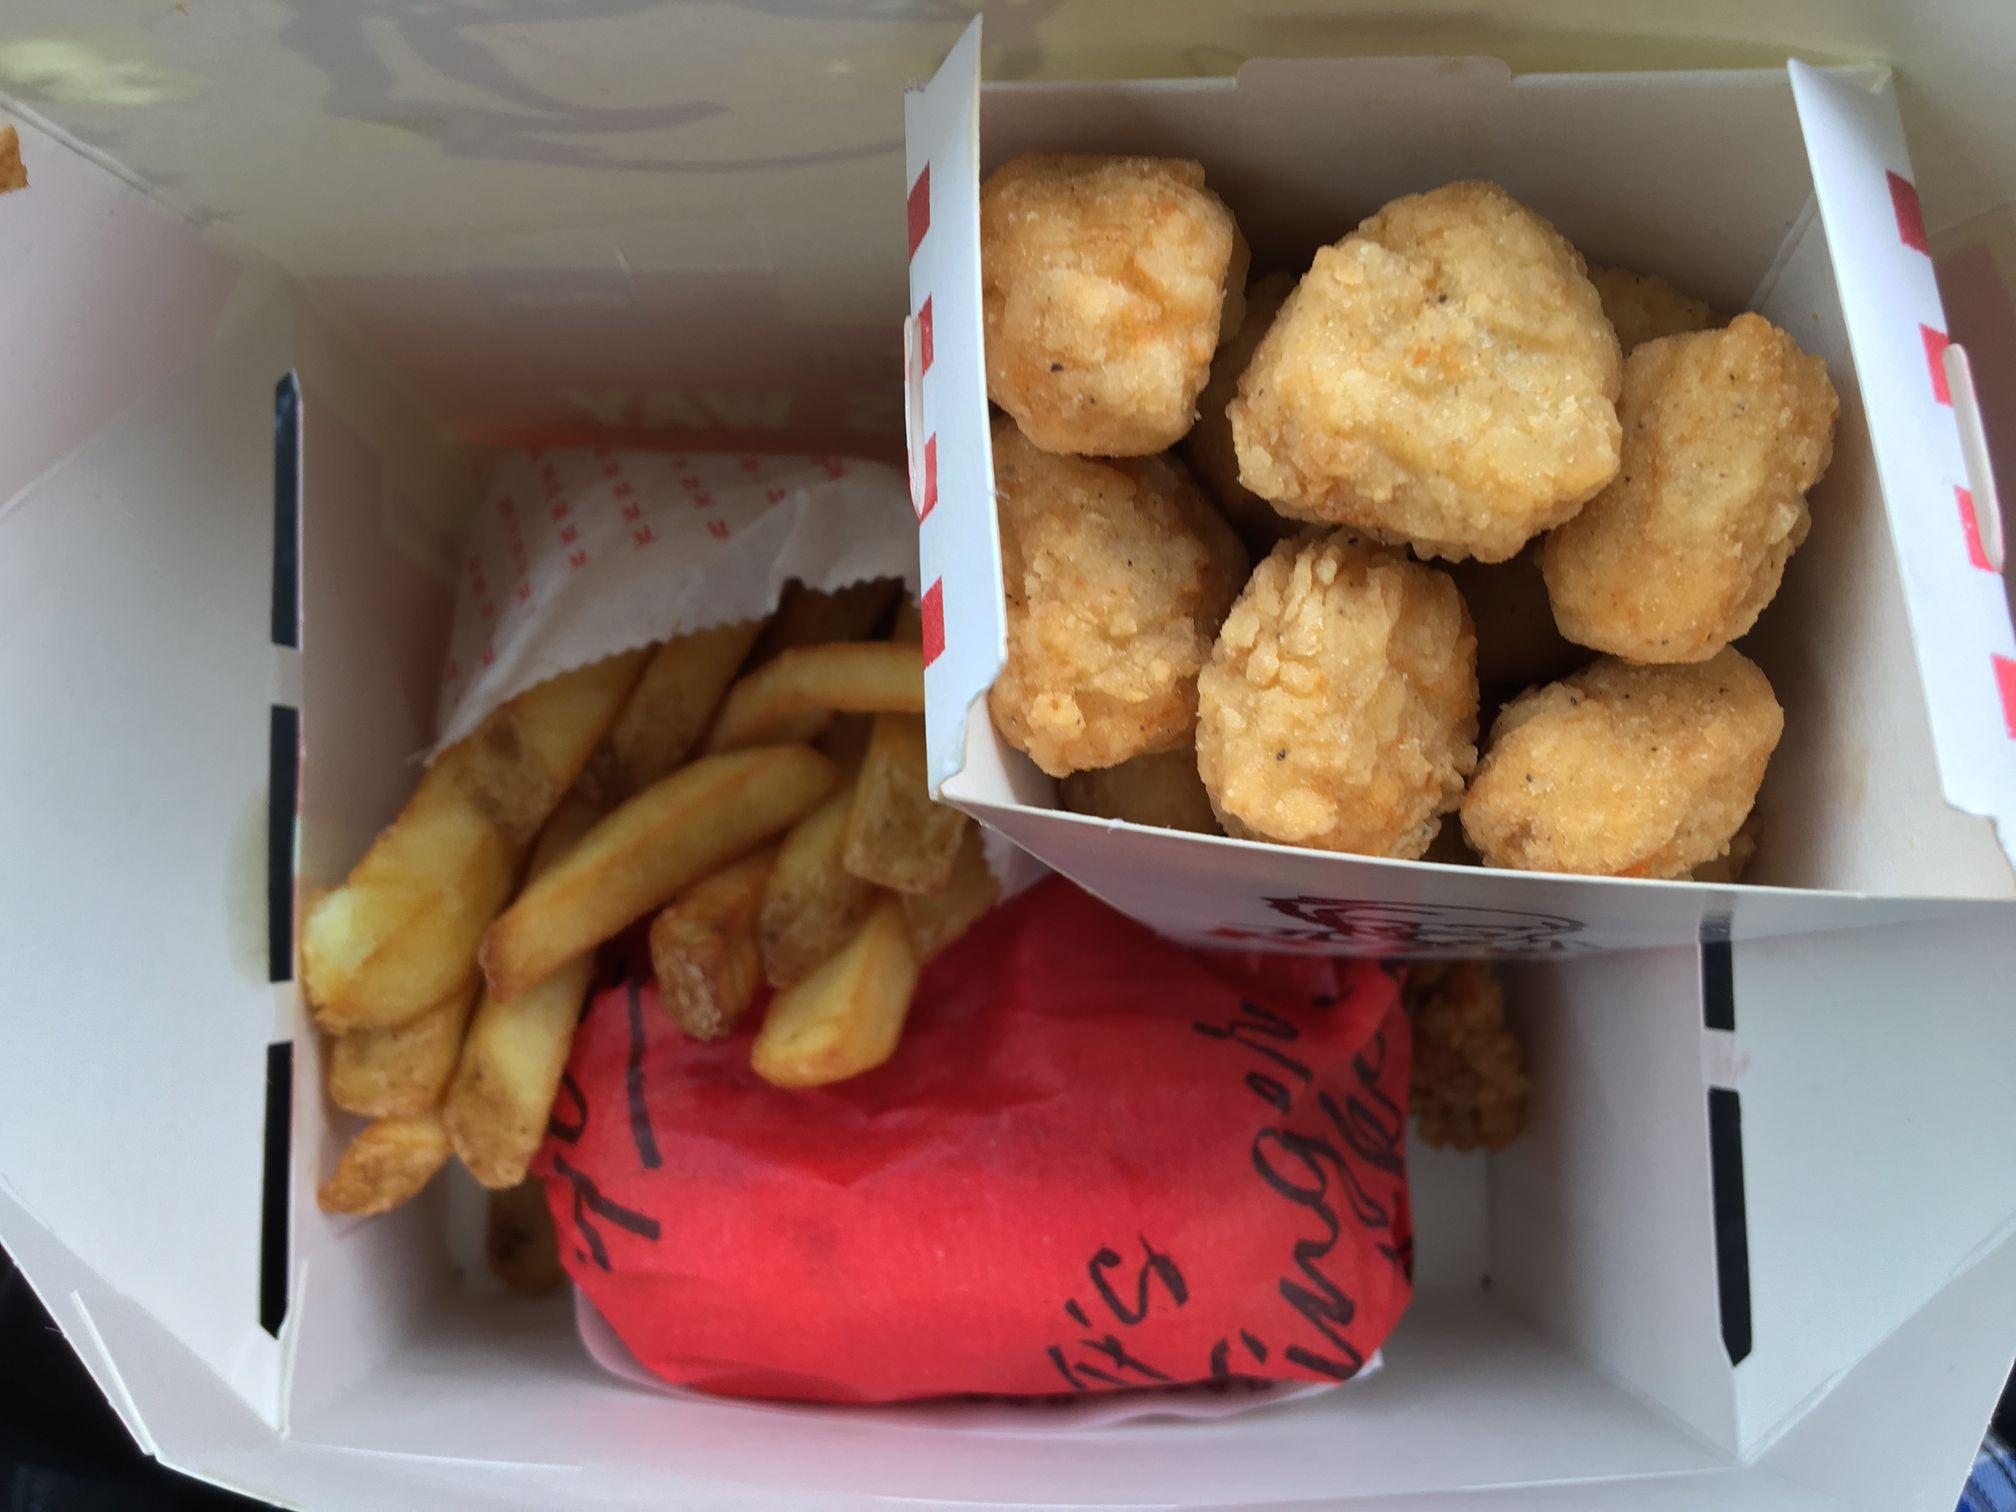 KFC £1.99 Lunch